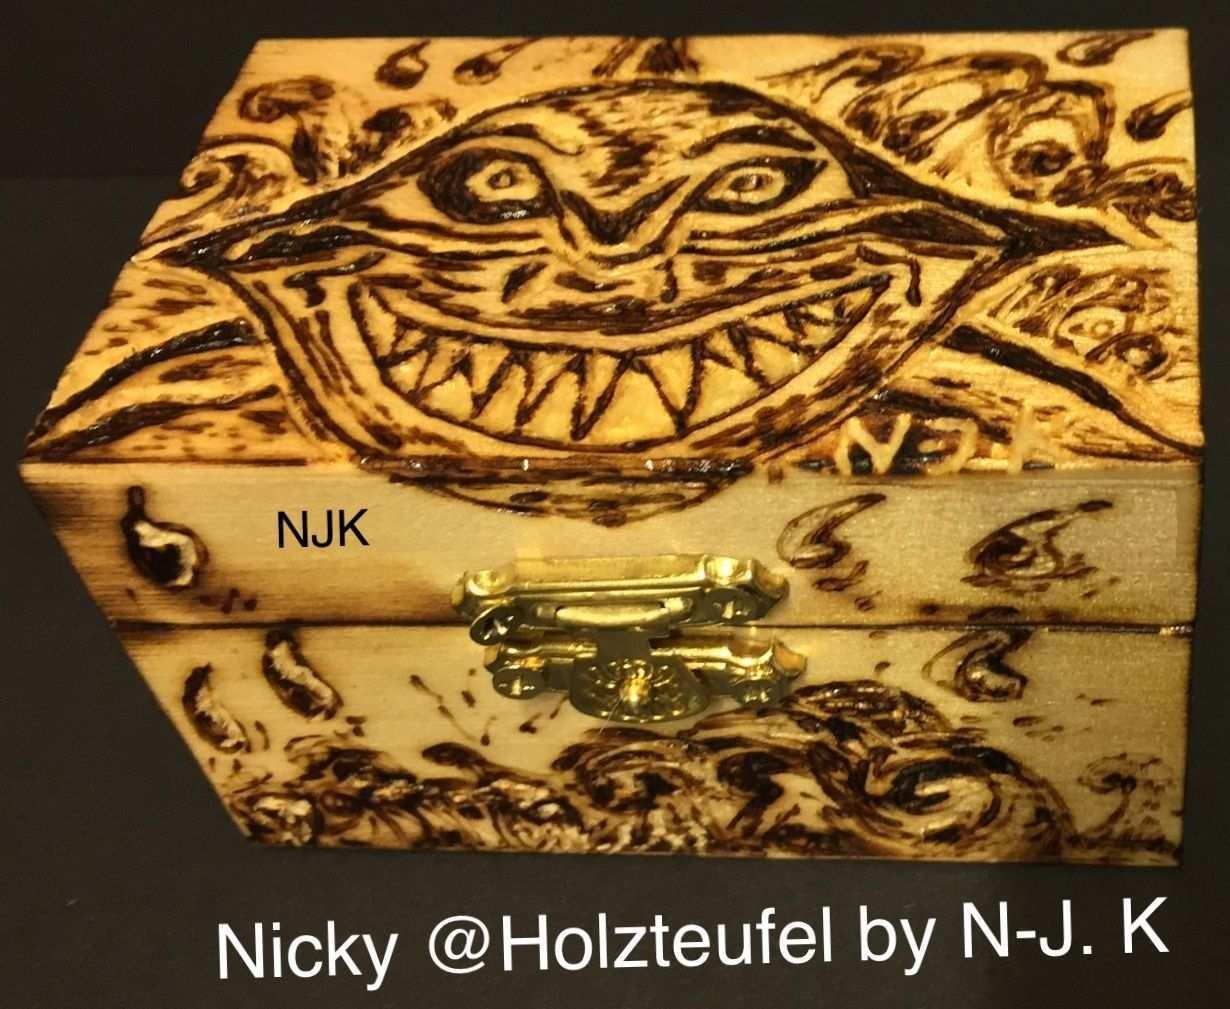 Holz Box Kiste Hai Lustig Fun 3d Brandmalerei Nicky Holzteufel By N J K Kunst Zeichnung Handwerk Brandmalerei Holzschnitzkunst Zeichnung